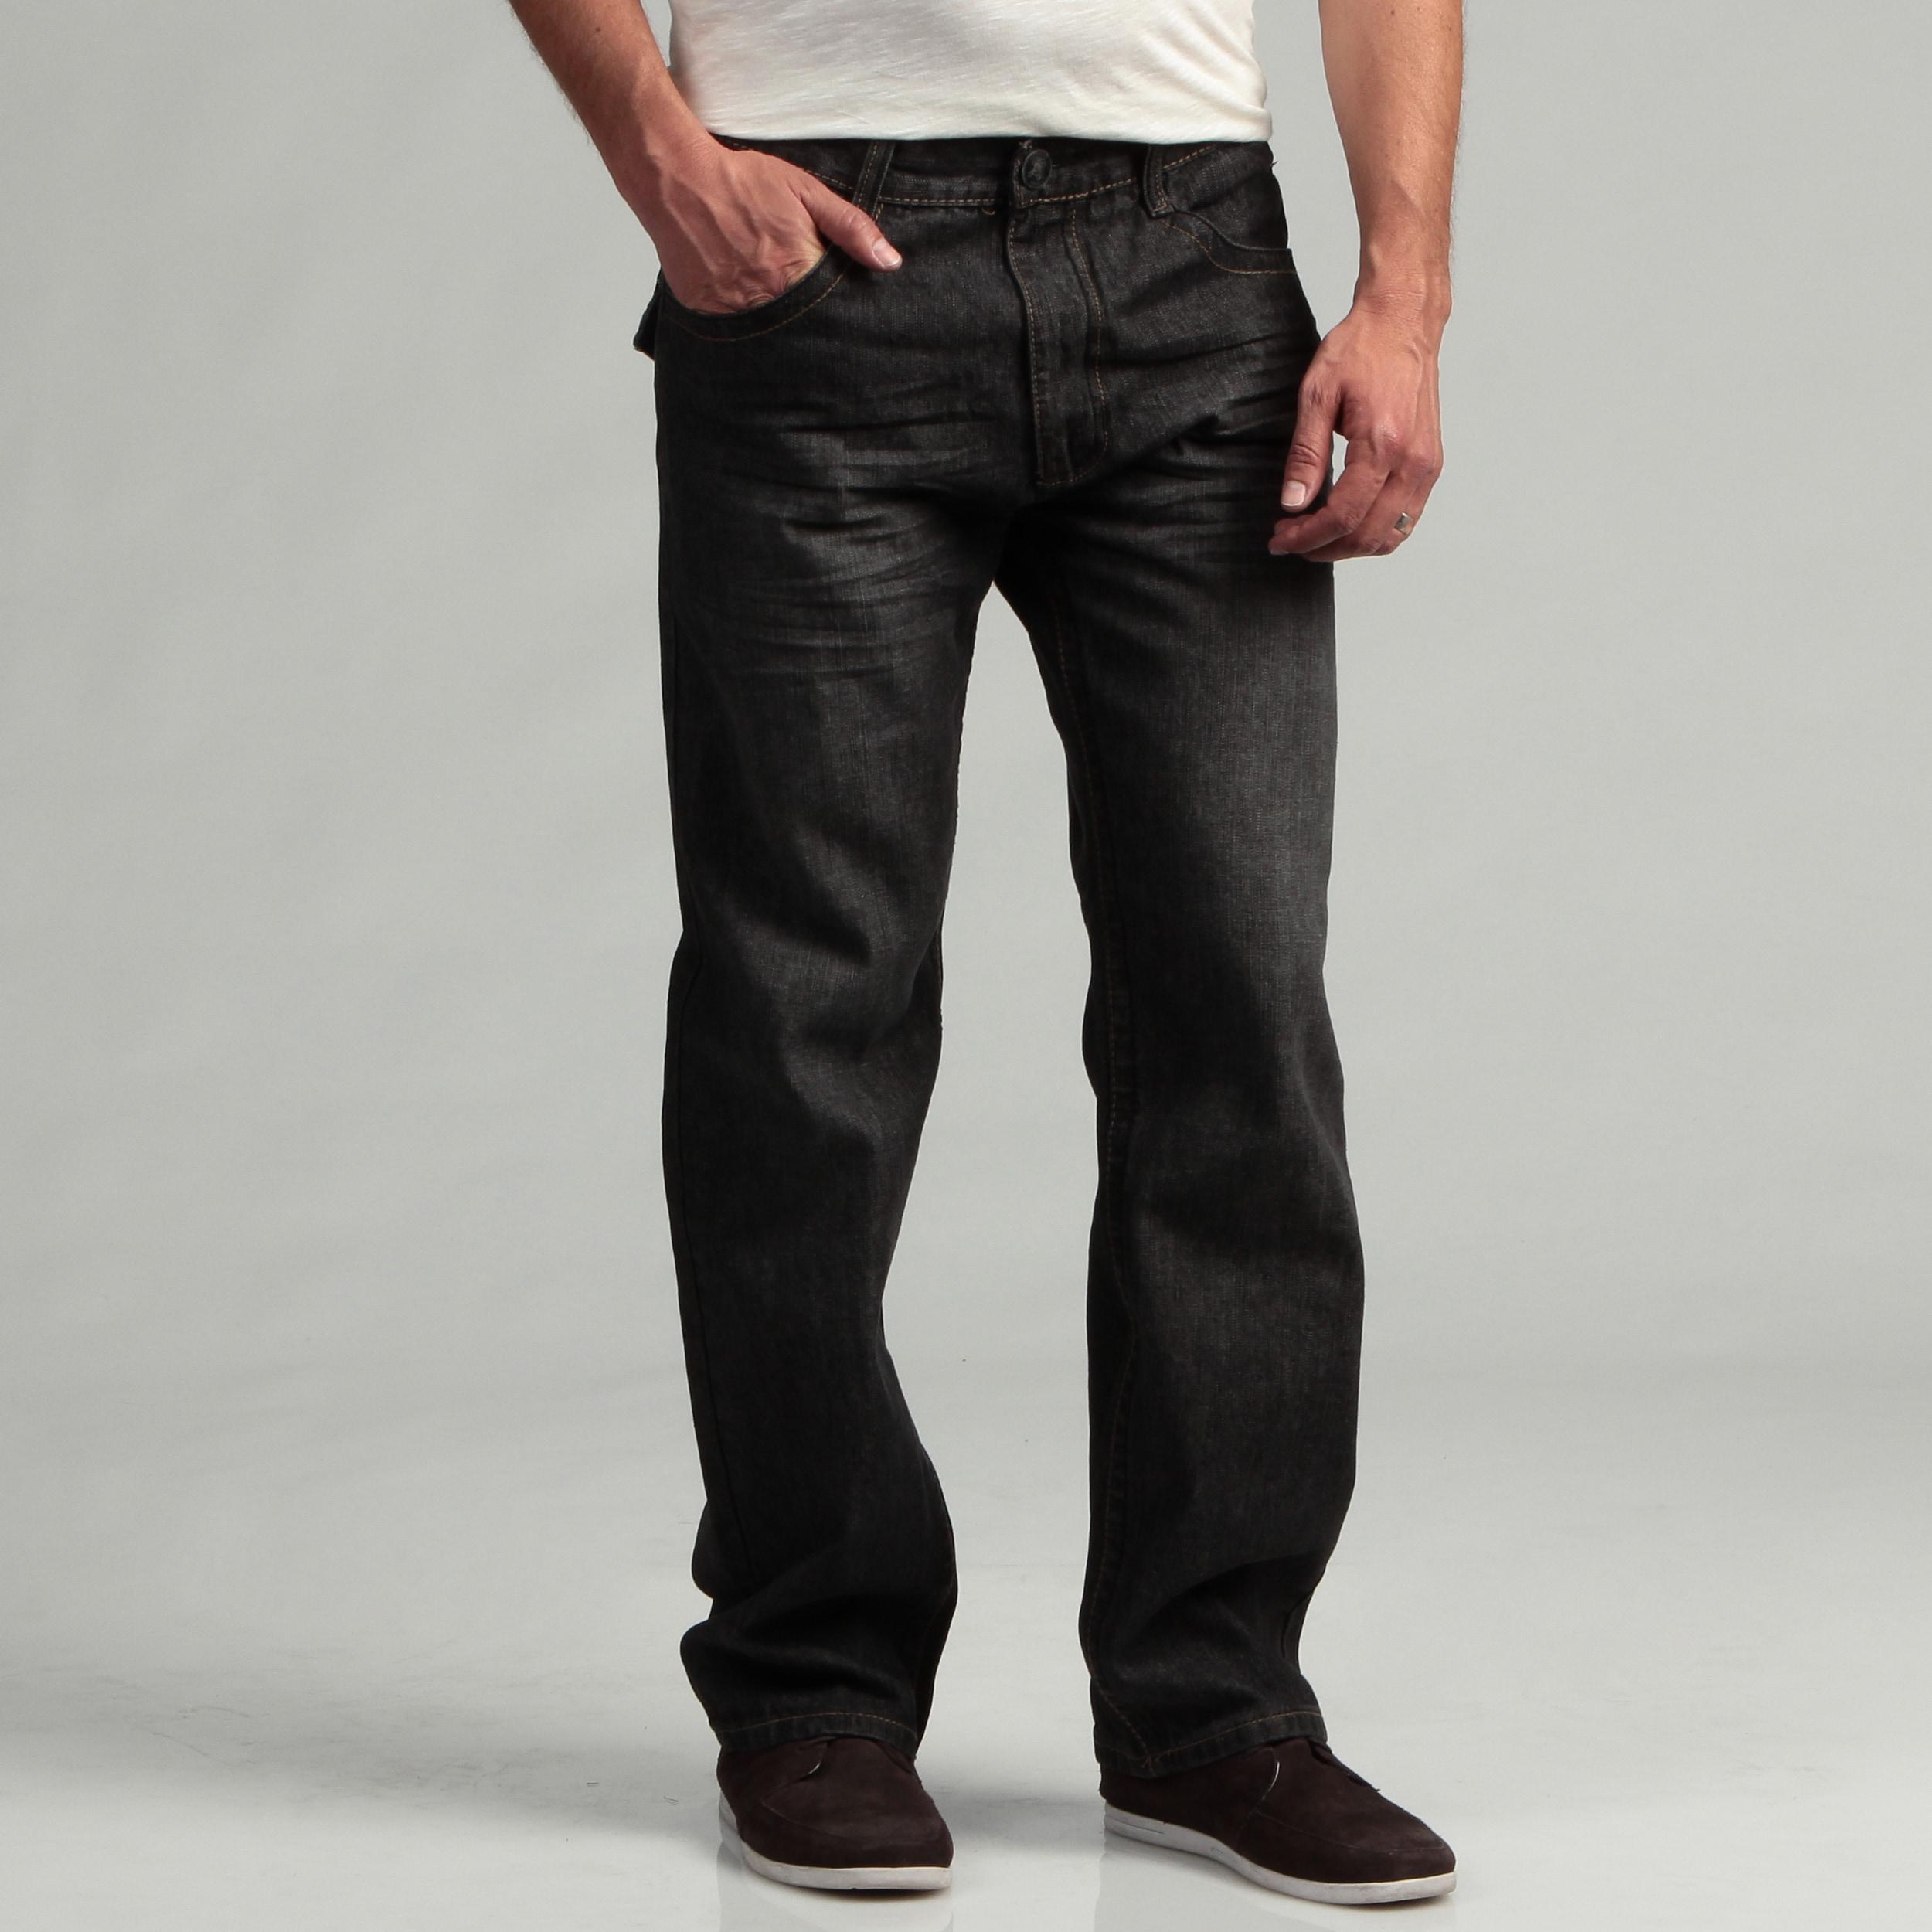 Shop Southpole Men s Black Sand Denim Jeans - Free Shipping On ... c8a76955b